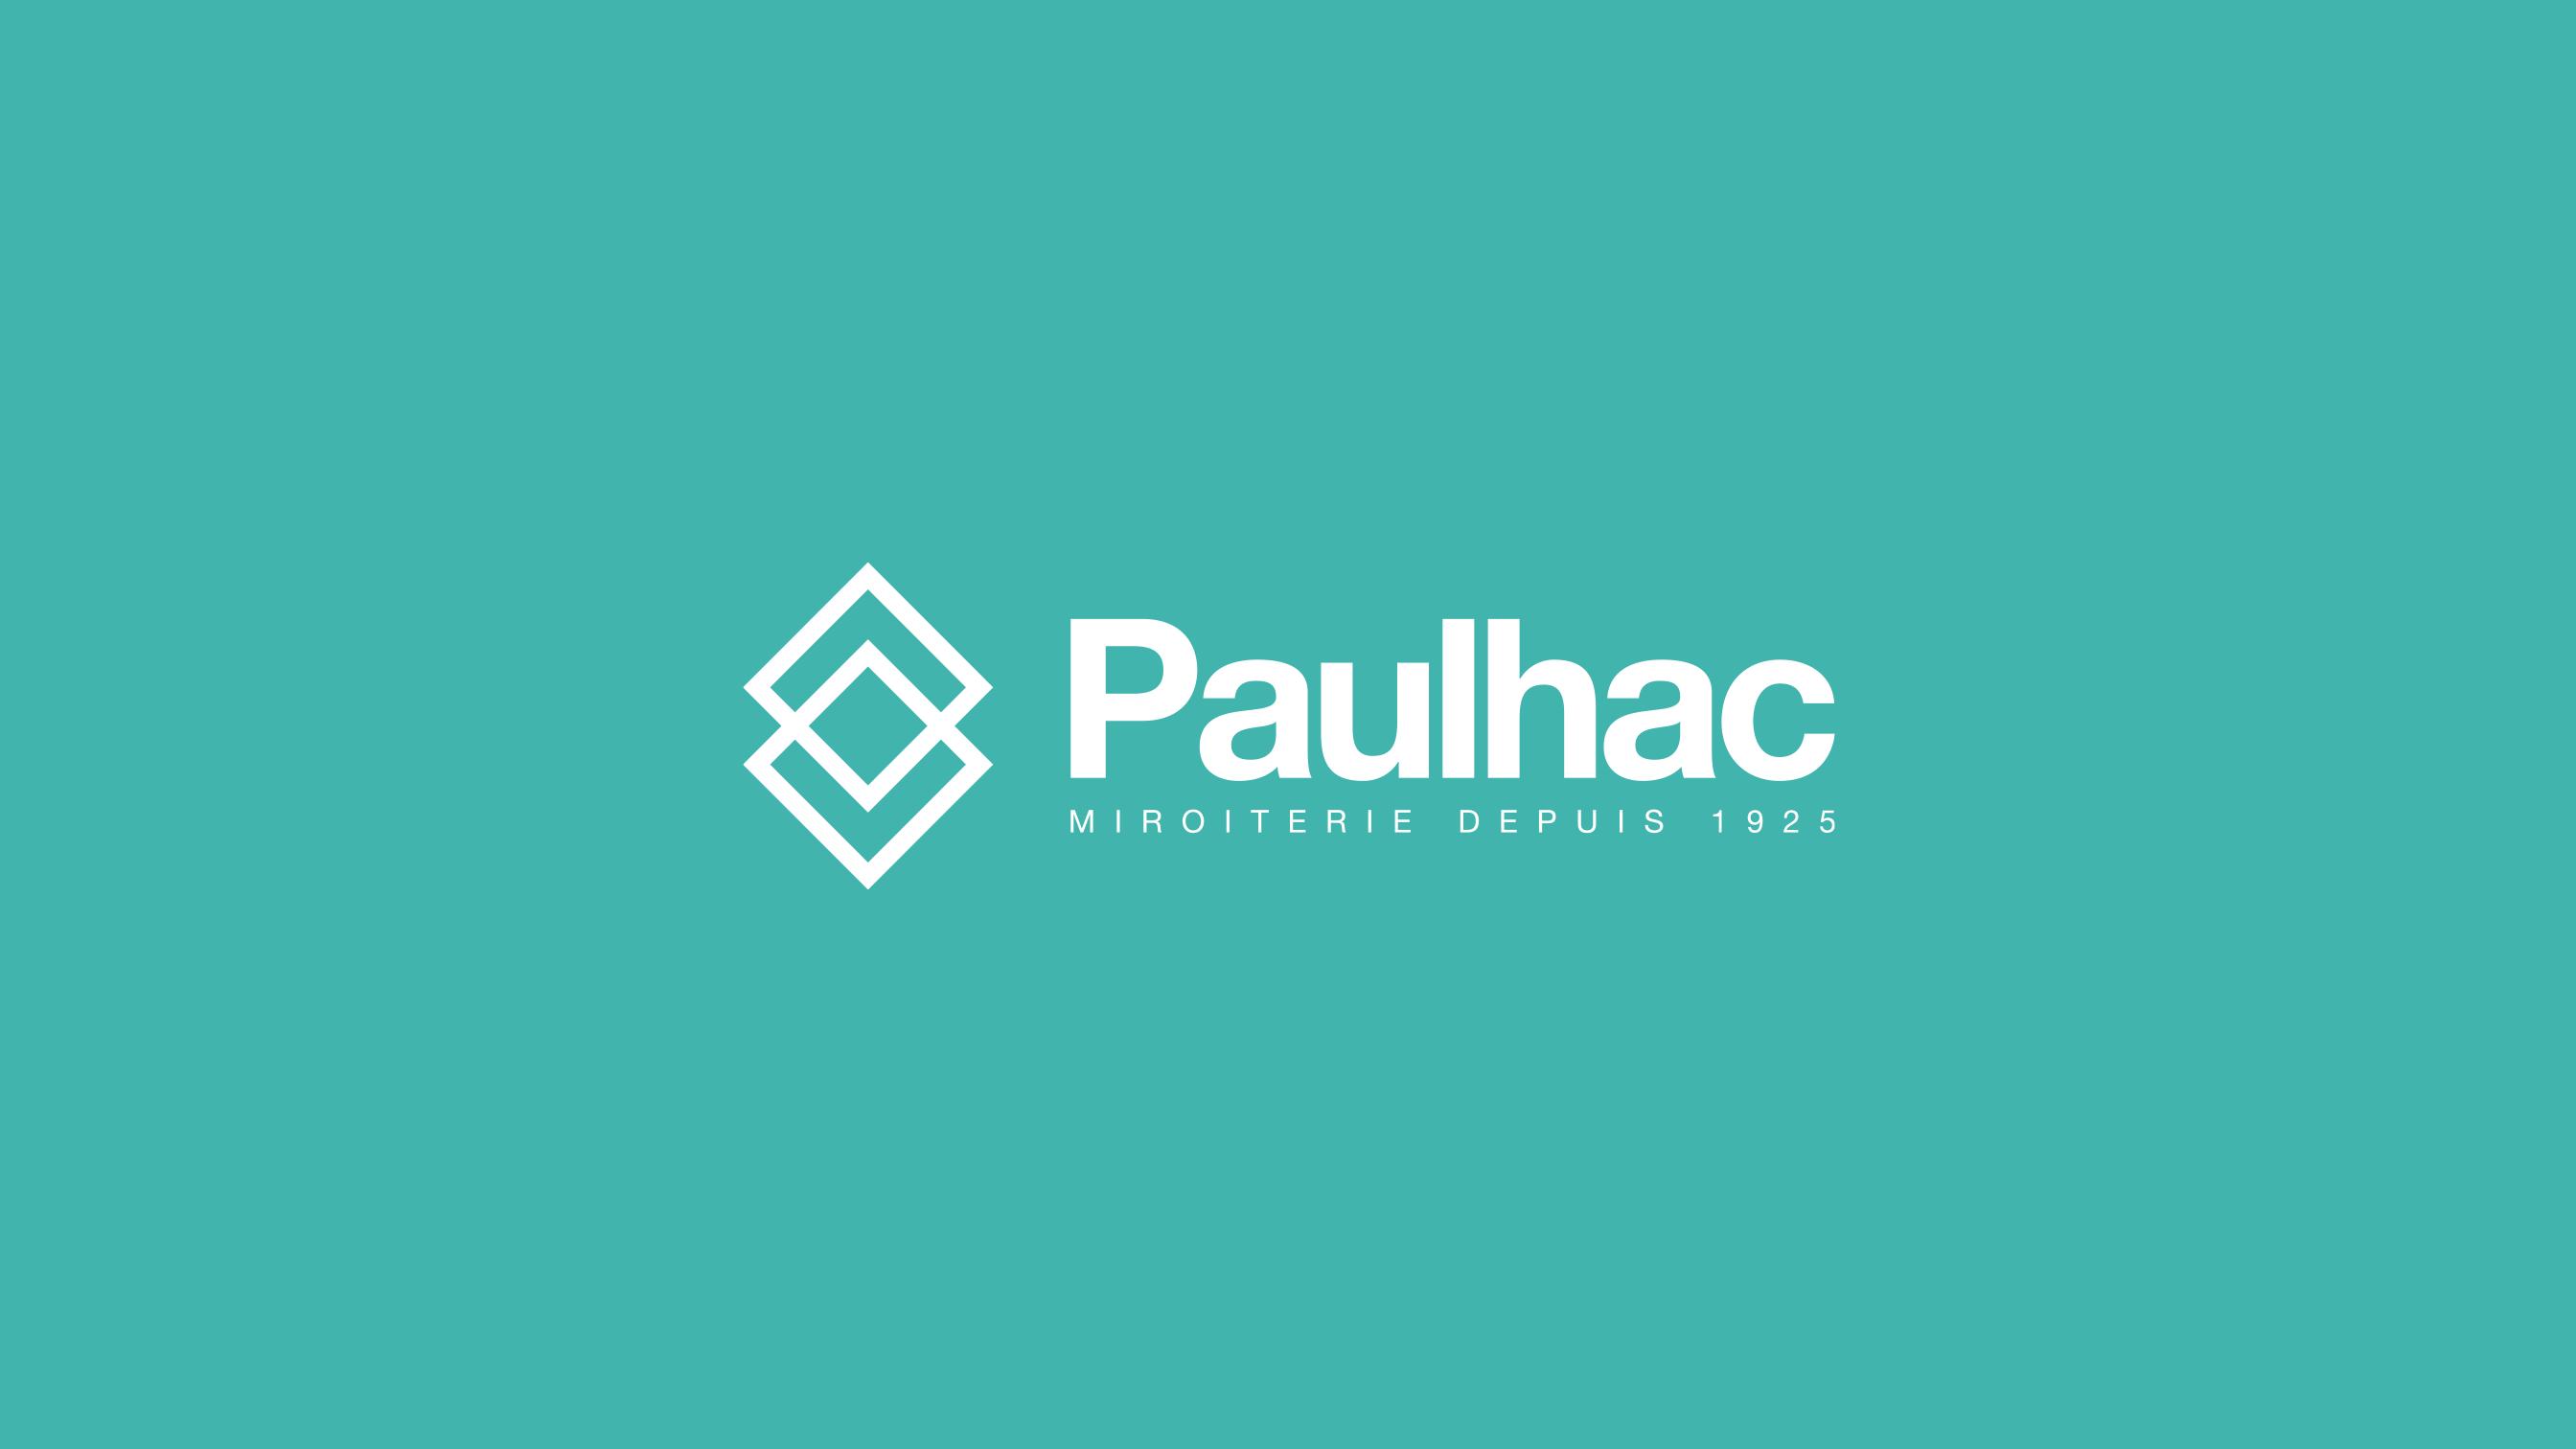 paulhac-01-logotype-pikteo